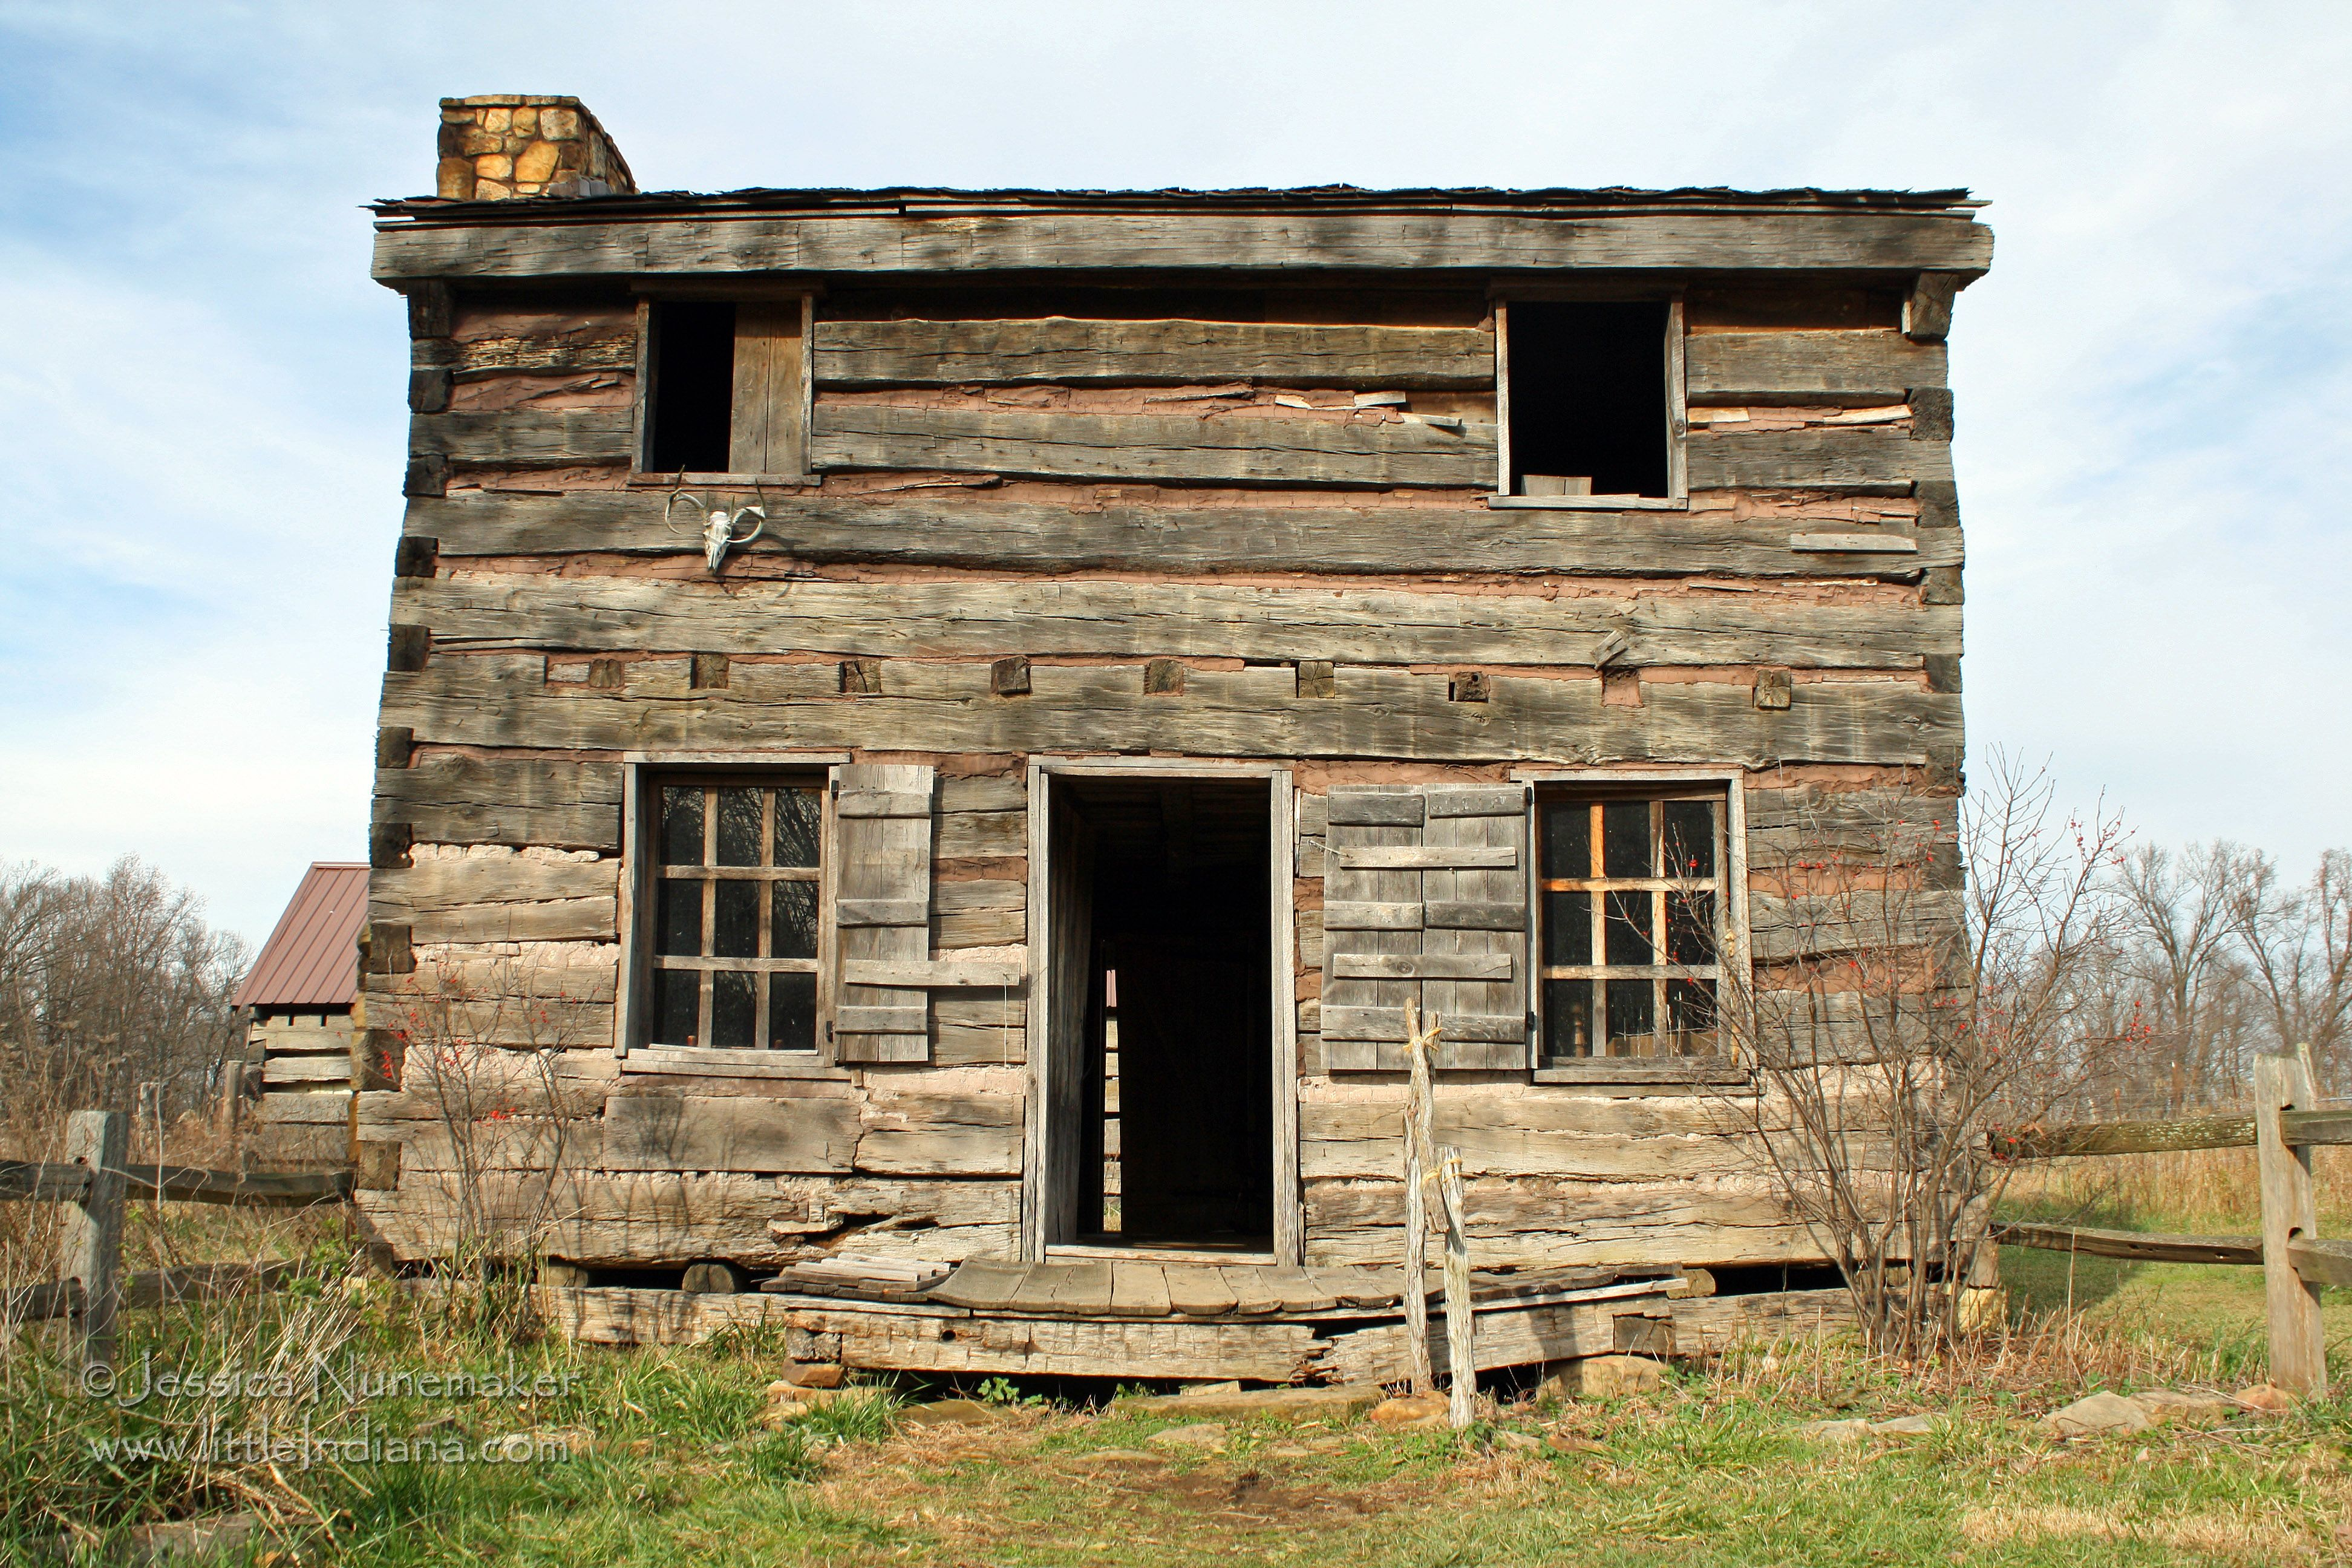 Lincoln Legendary Cabin In Lincoln City Indiana Abe Slept Here Lincoln City Indiana Cabin